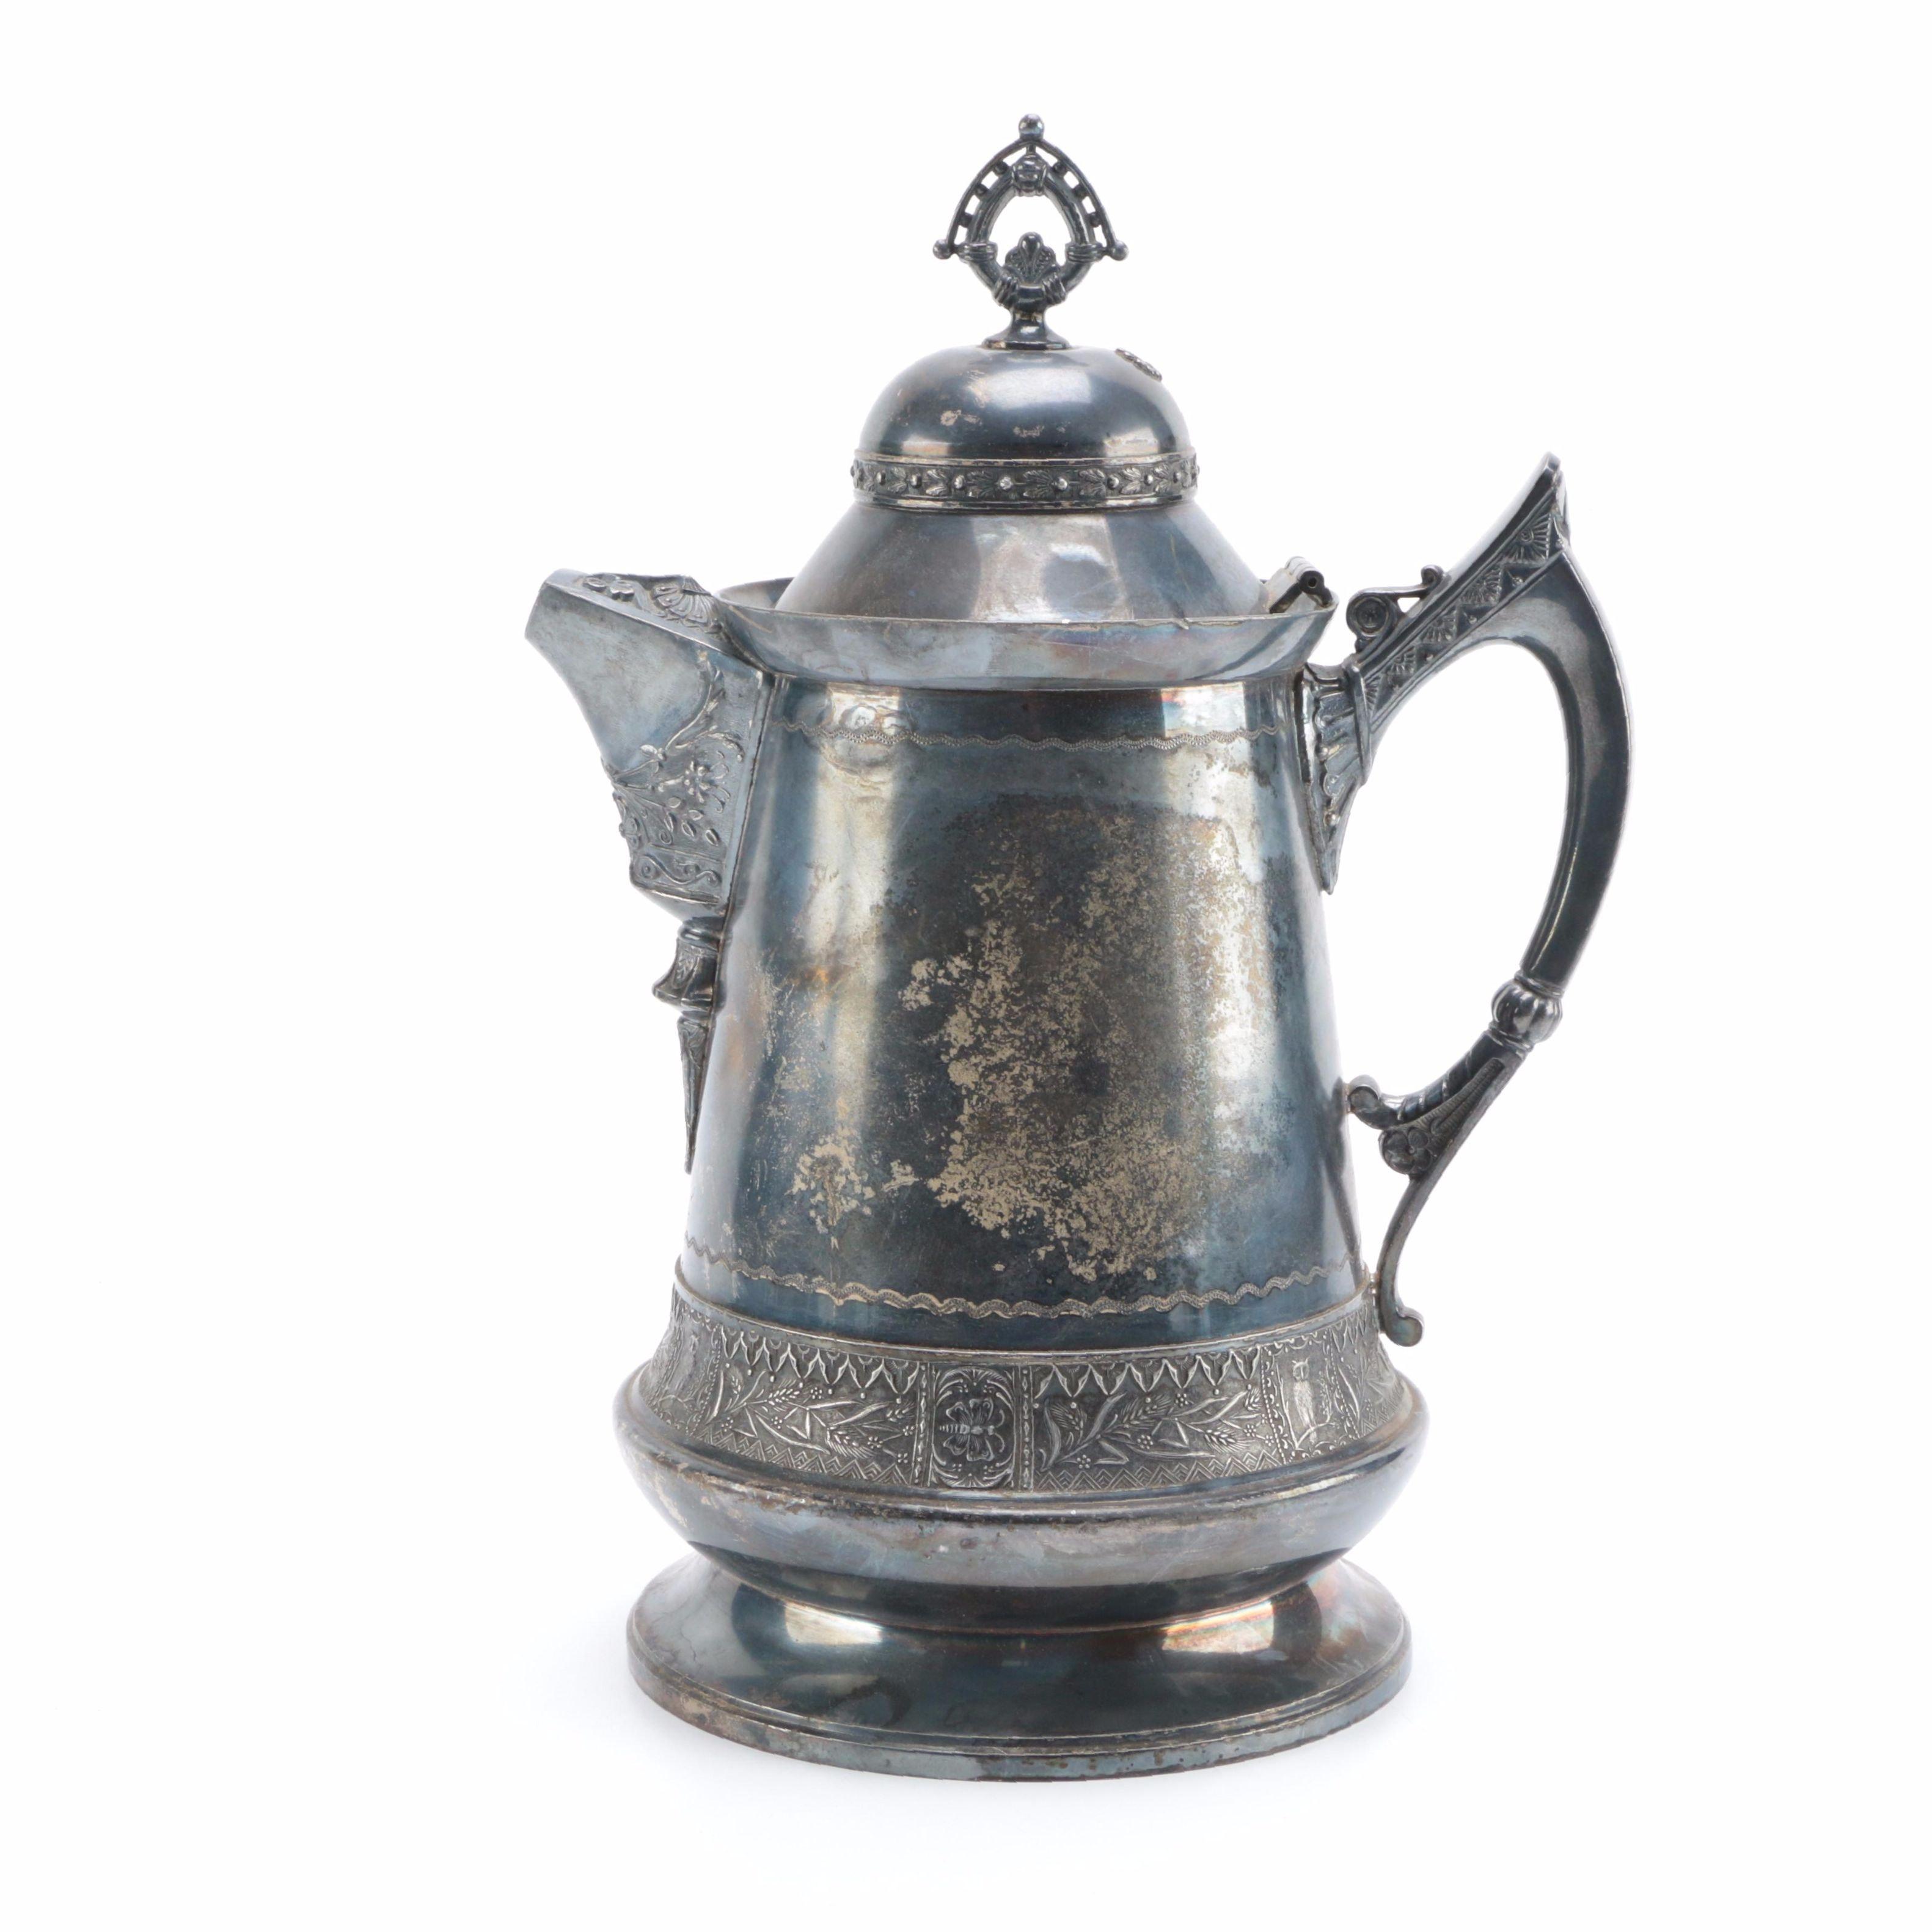 Antique Homans Silver Co. Quadruple Plated Silver Water Pitcher